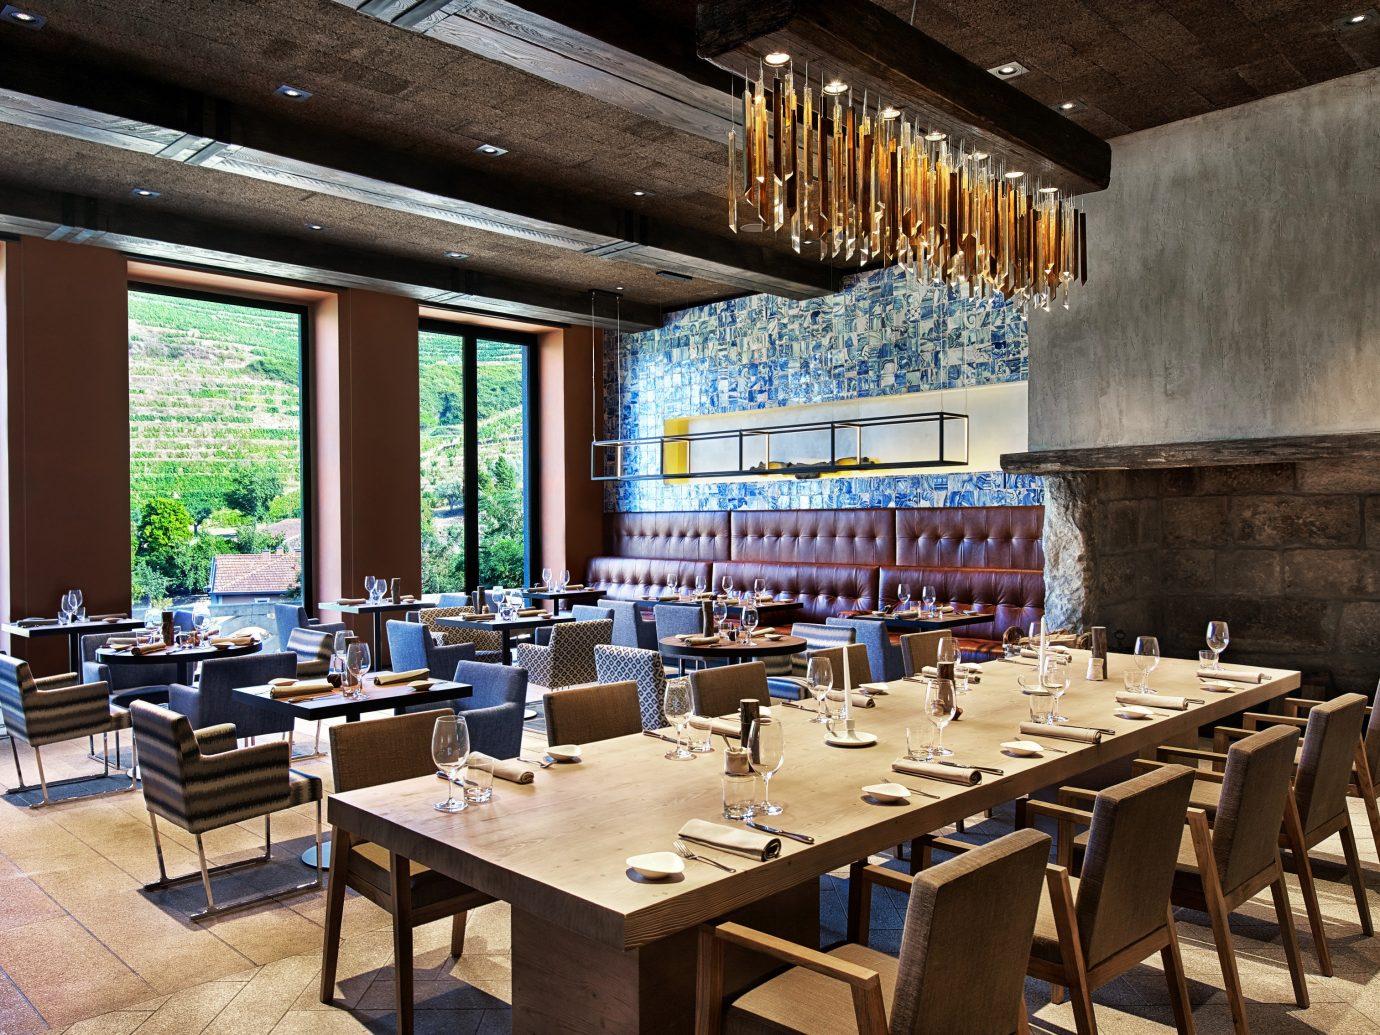 Dining Trip Ideas indoor table floor window ceiling room restaurant estate interior design Resort meal Bar furniture Island area dining room